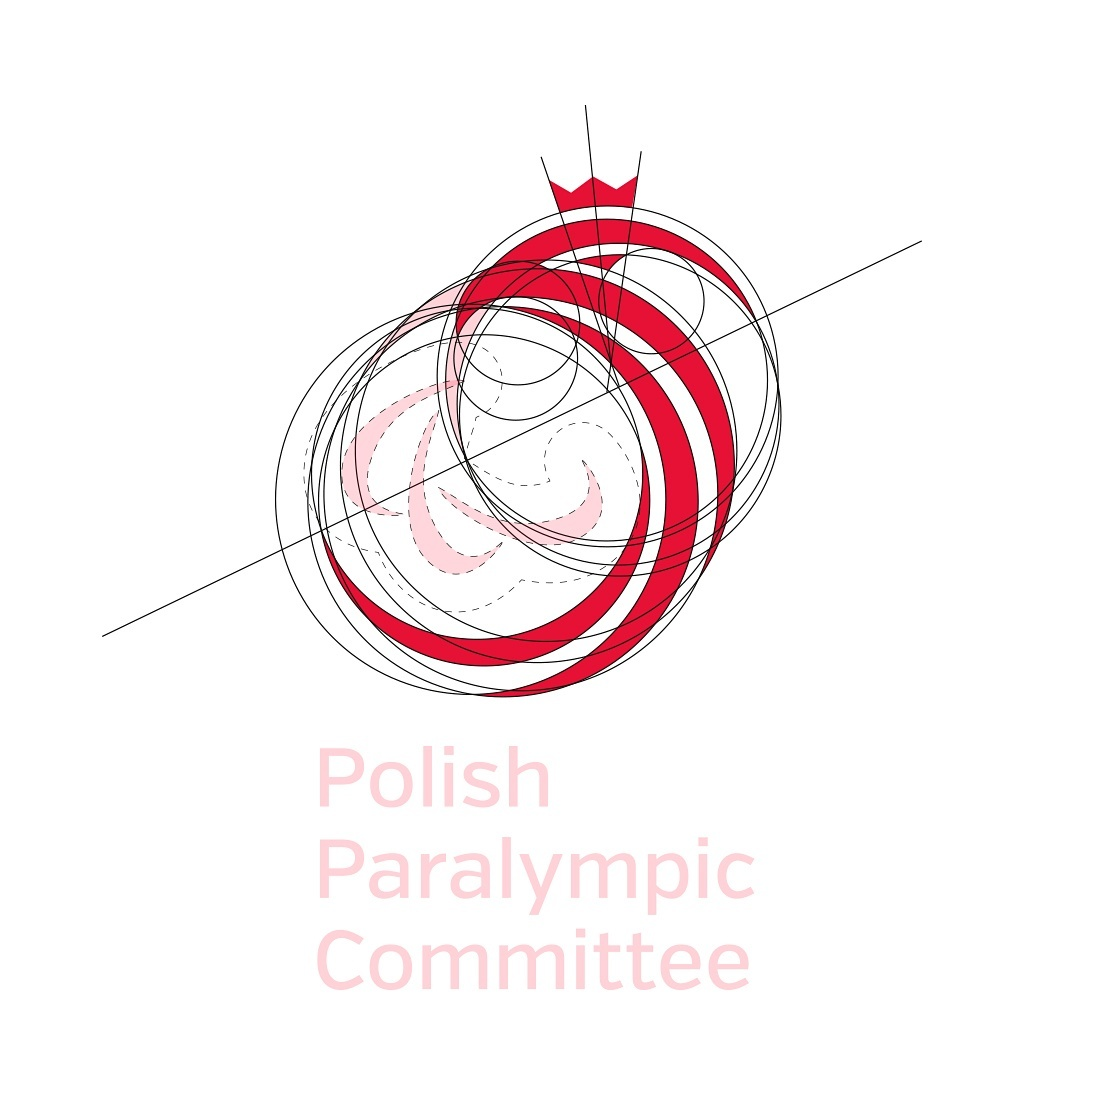 https://ponad.pl/wp-content/uploads/2015/10/polski-komitet-paraolimpijski-nowe-logo-geometria-znaku.jpg